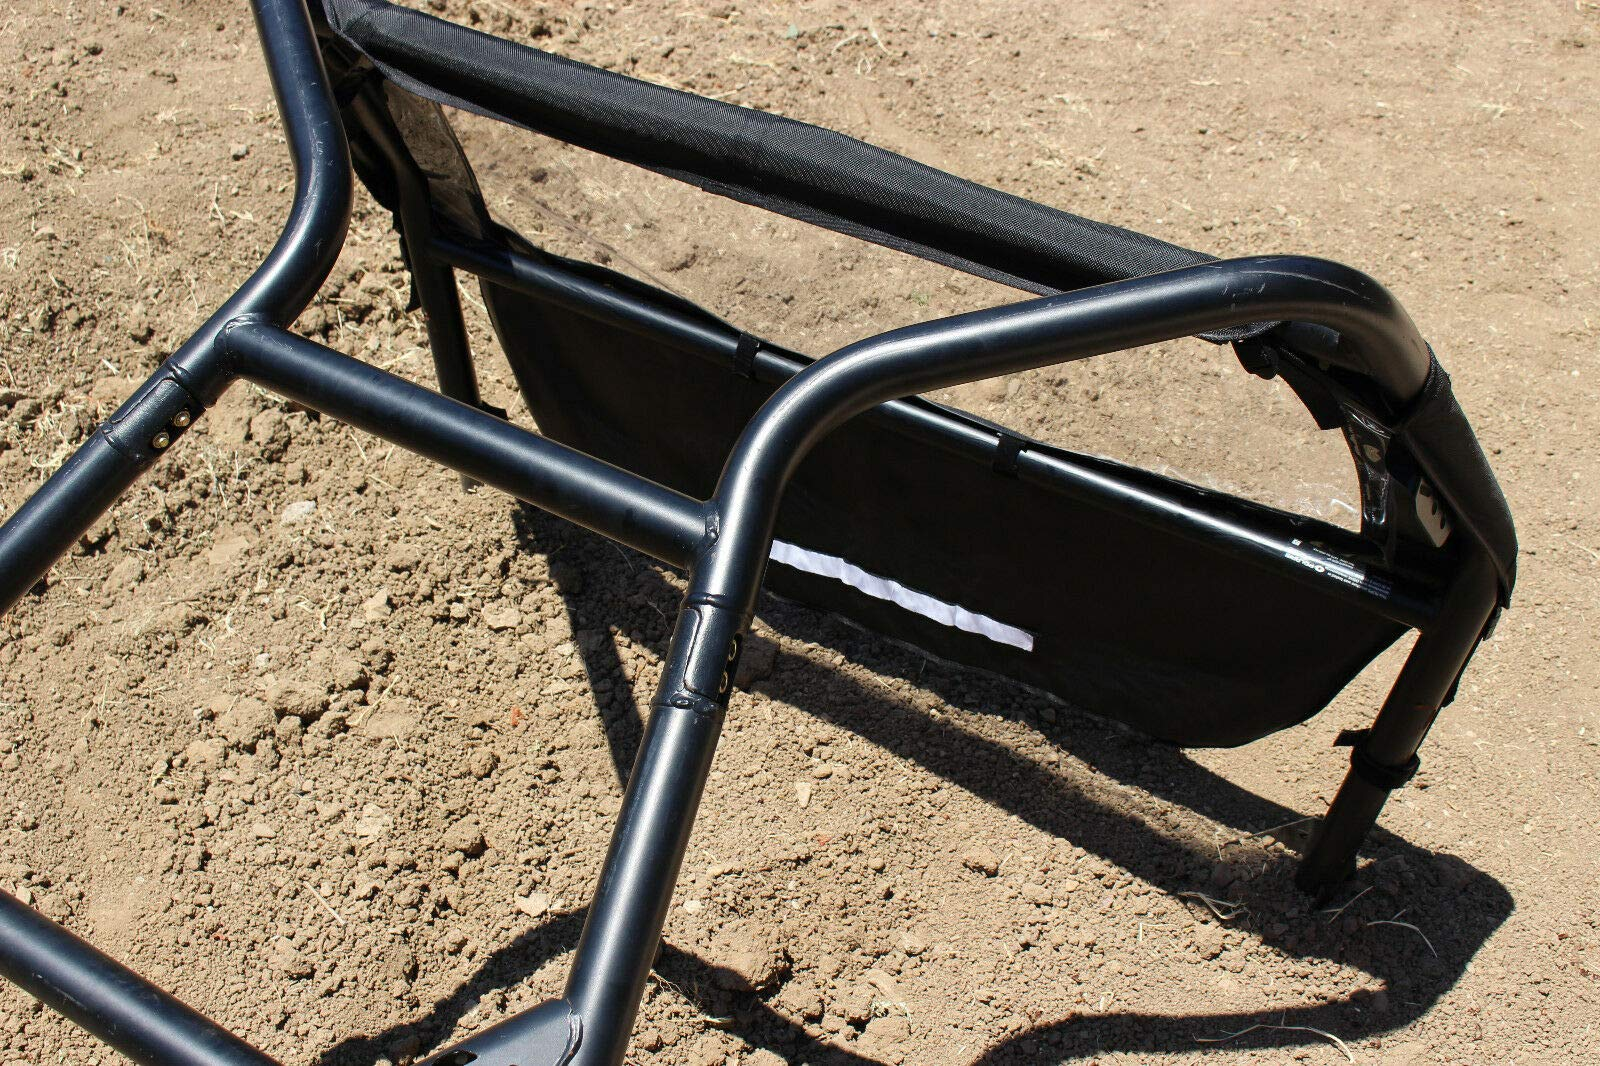 Dirt Specialties New Polaris RZR 800, 800S XP900, XP4 900 570 Rear Window/Cover 2008-17 by Dirt Specialties (Image #6)